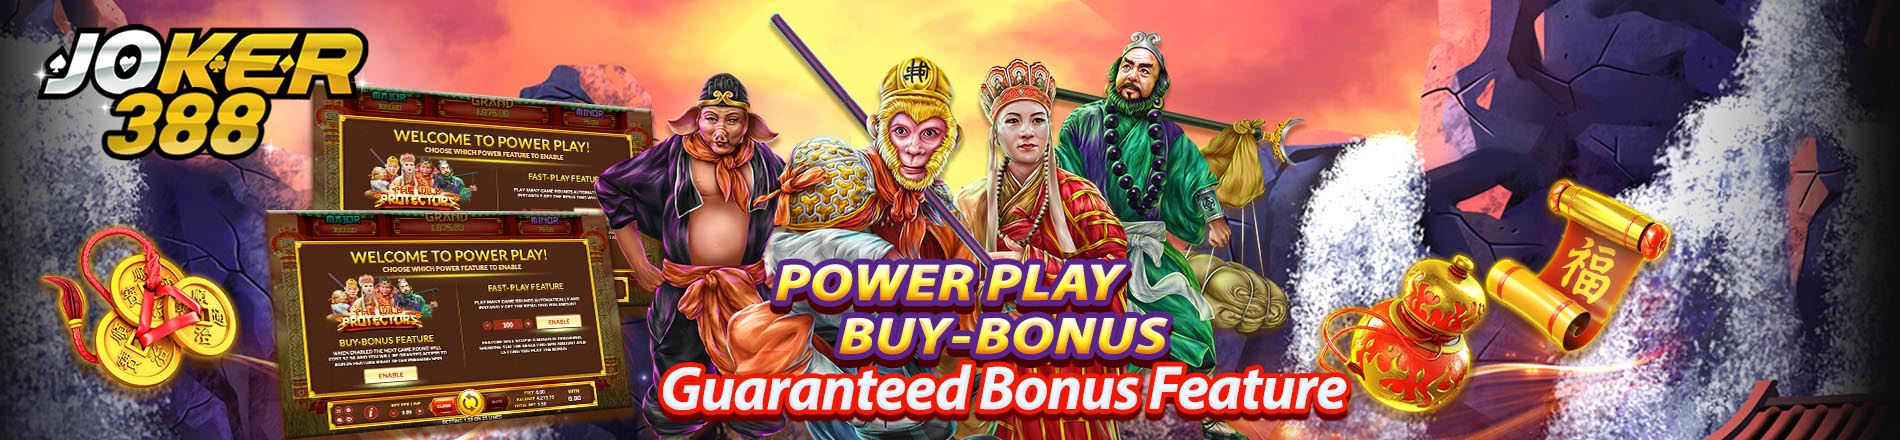 download joker388 apk deposit joker388 agen slot joker388 terpercaya